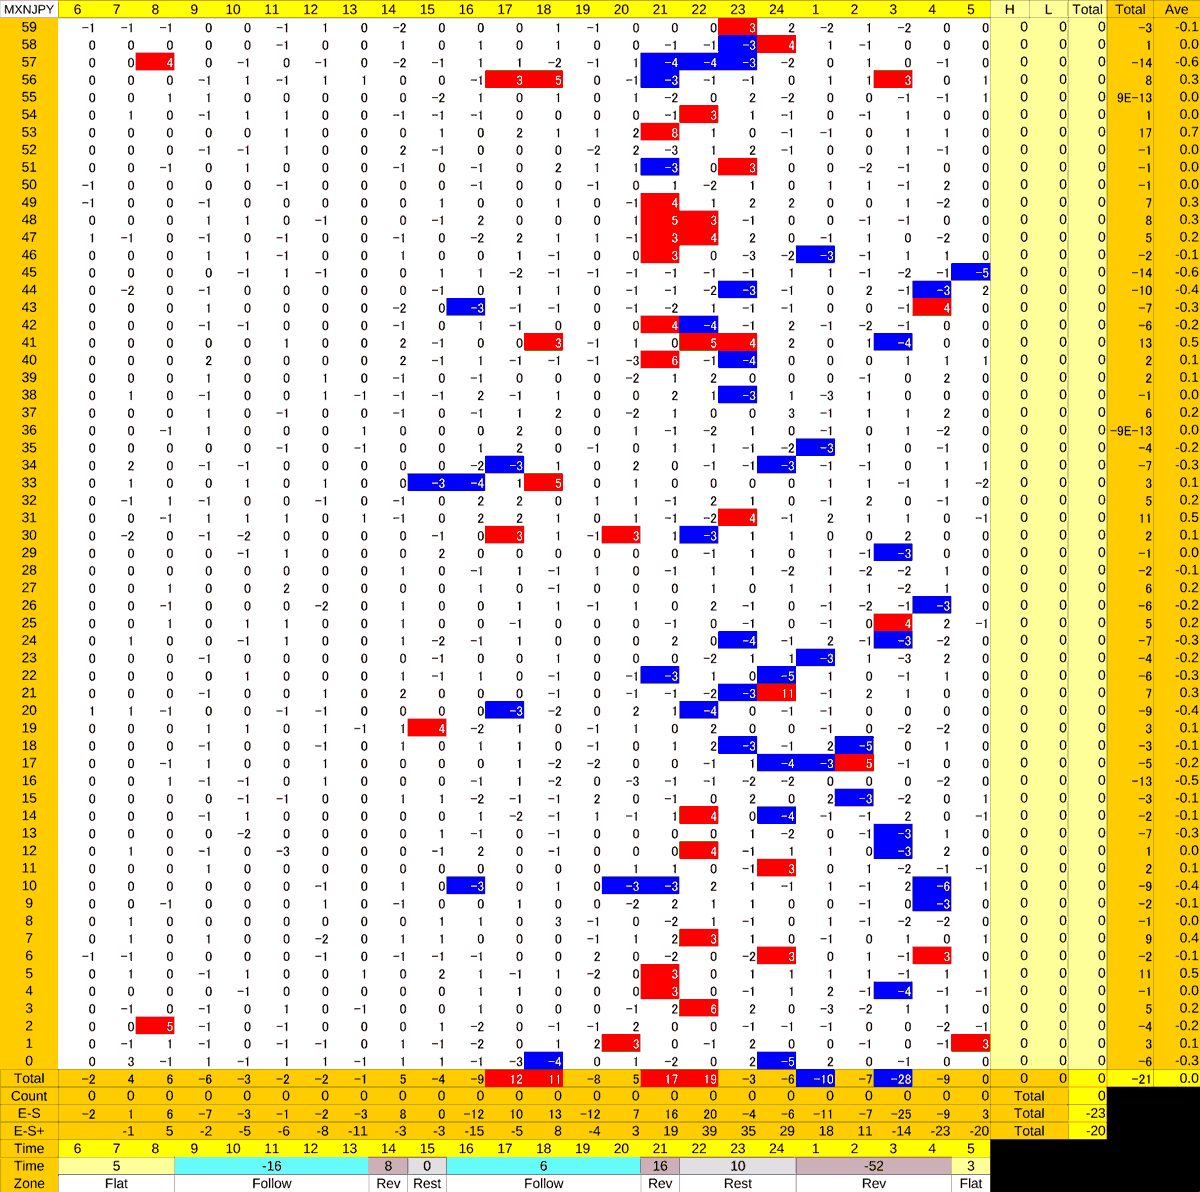 20200910_HS(3)MXNJPY